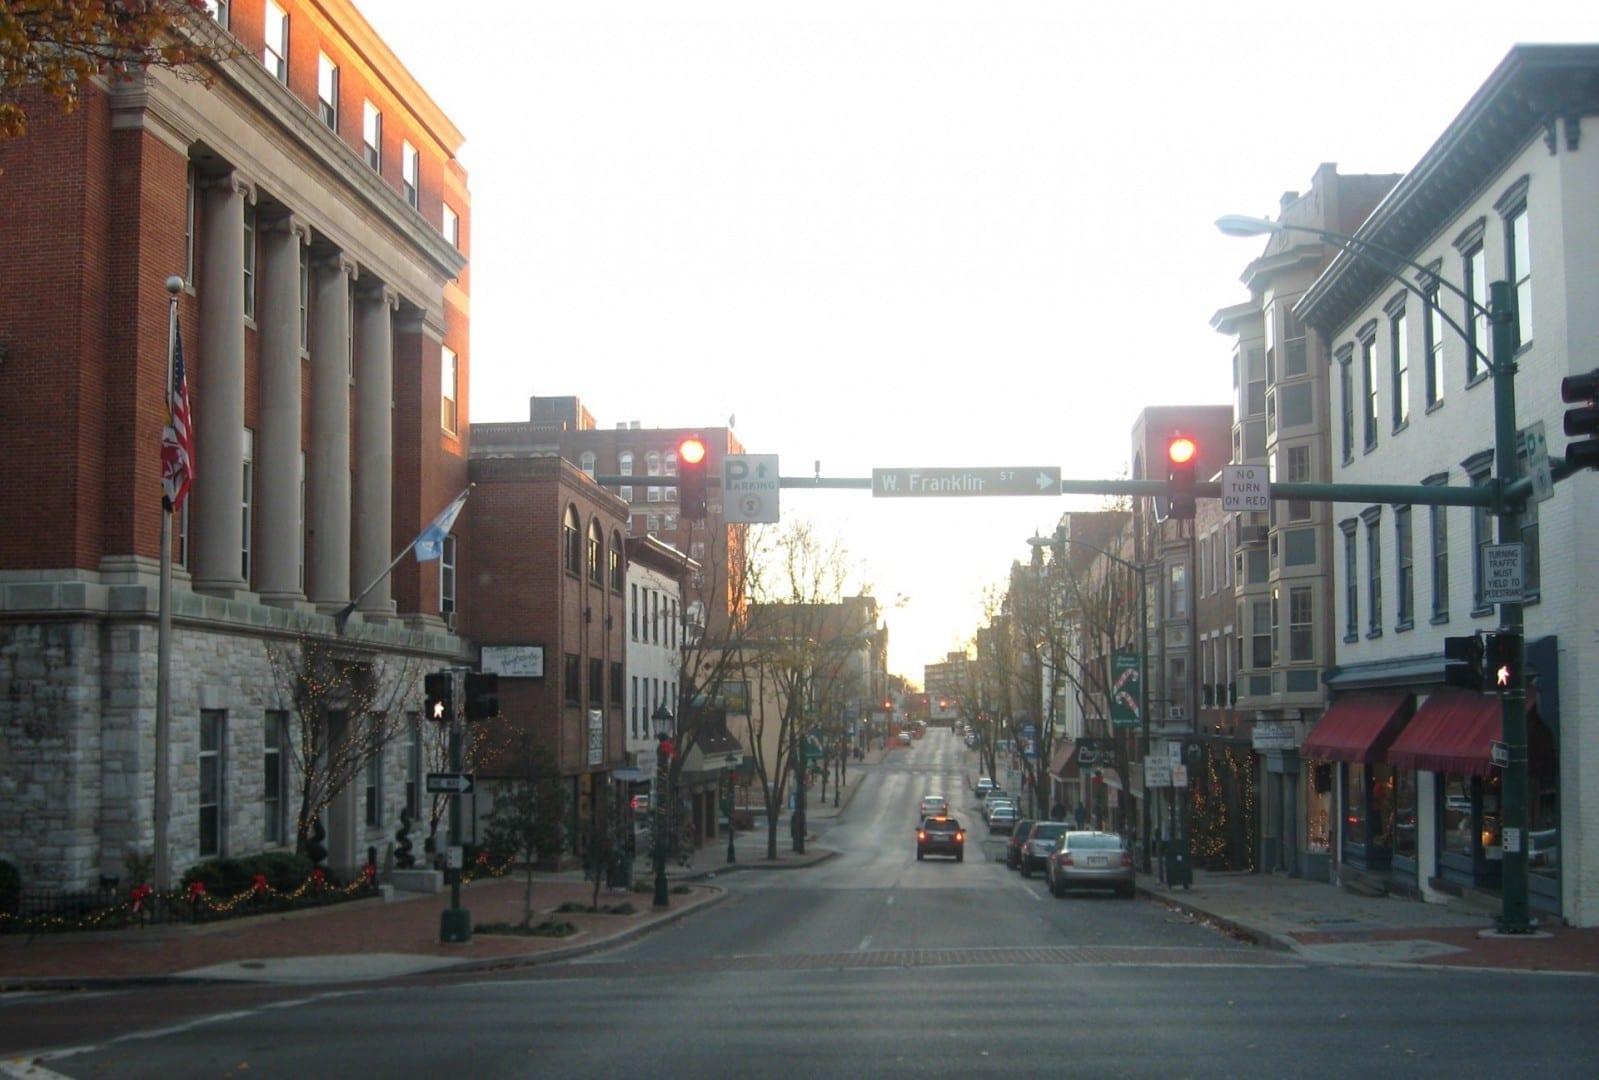 Calle Potomac, centro de Hagerstown. Hagerstown MD Estados Unidos